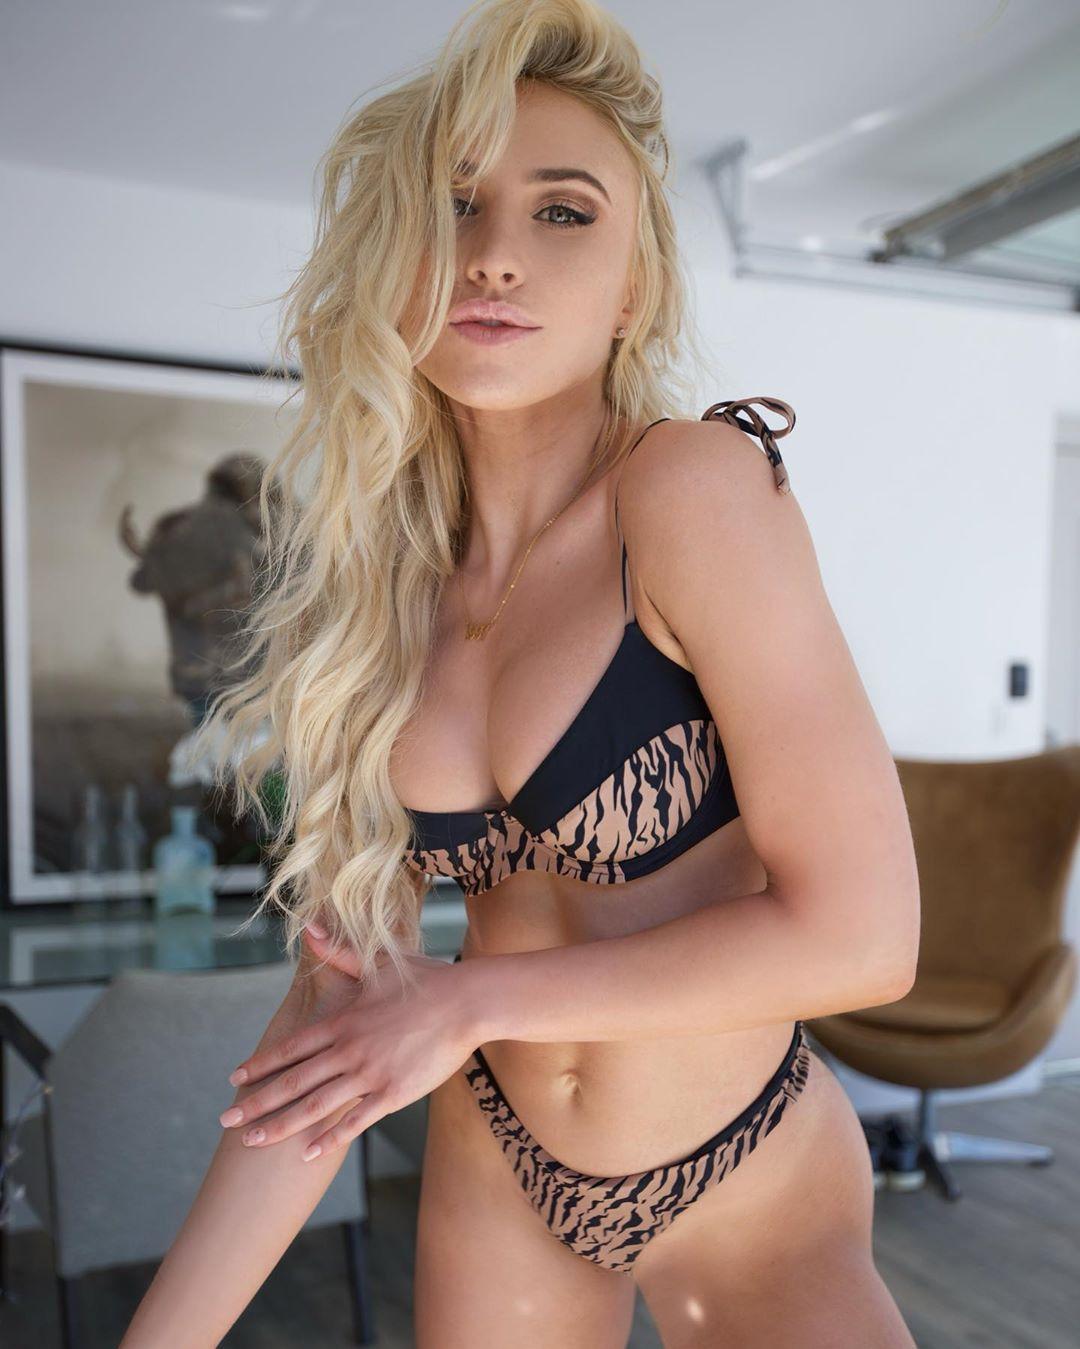 Lauren Dascalo Nude & Sex Tape Onlyfans Leaked 0033